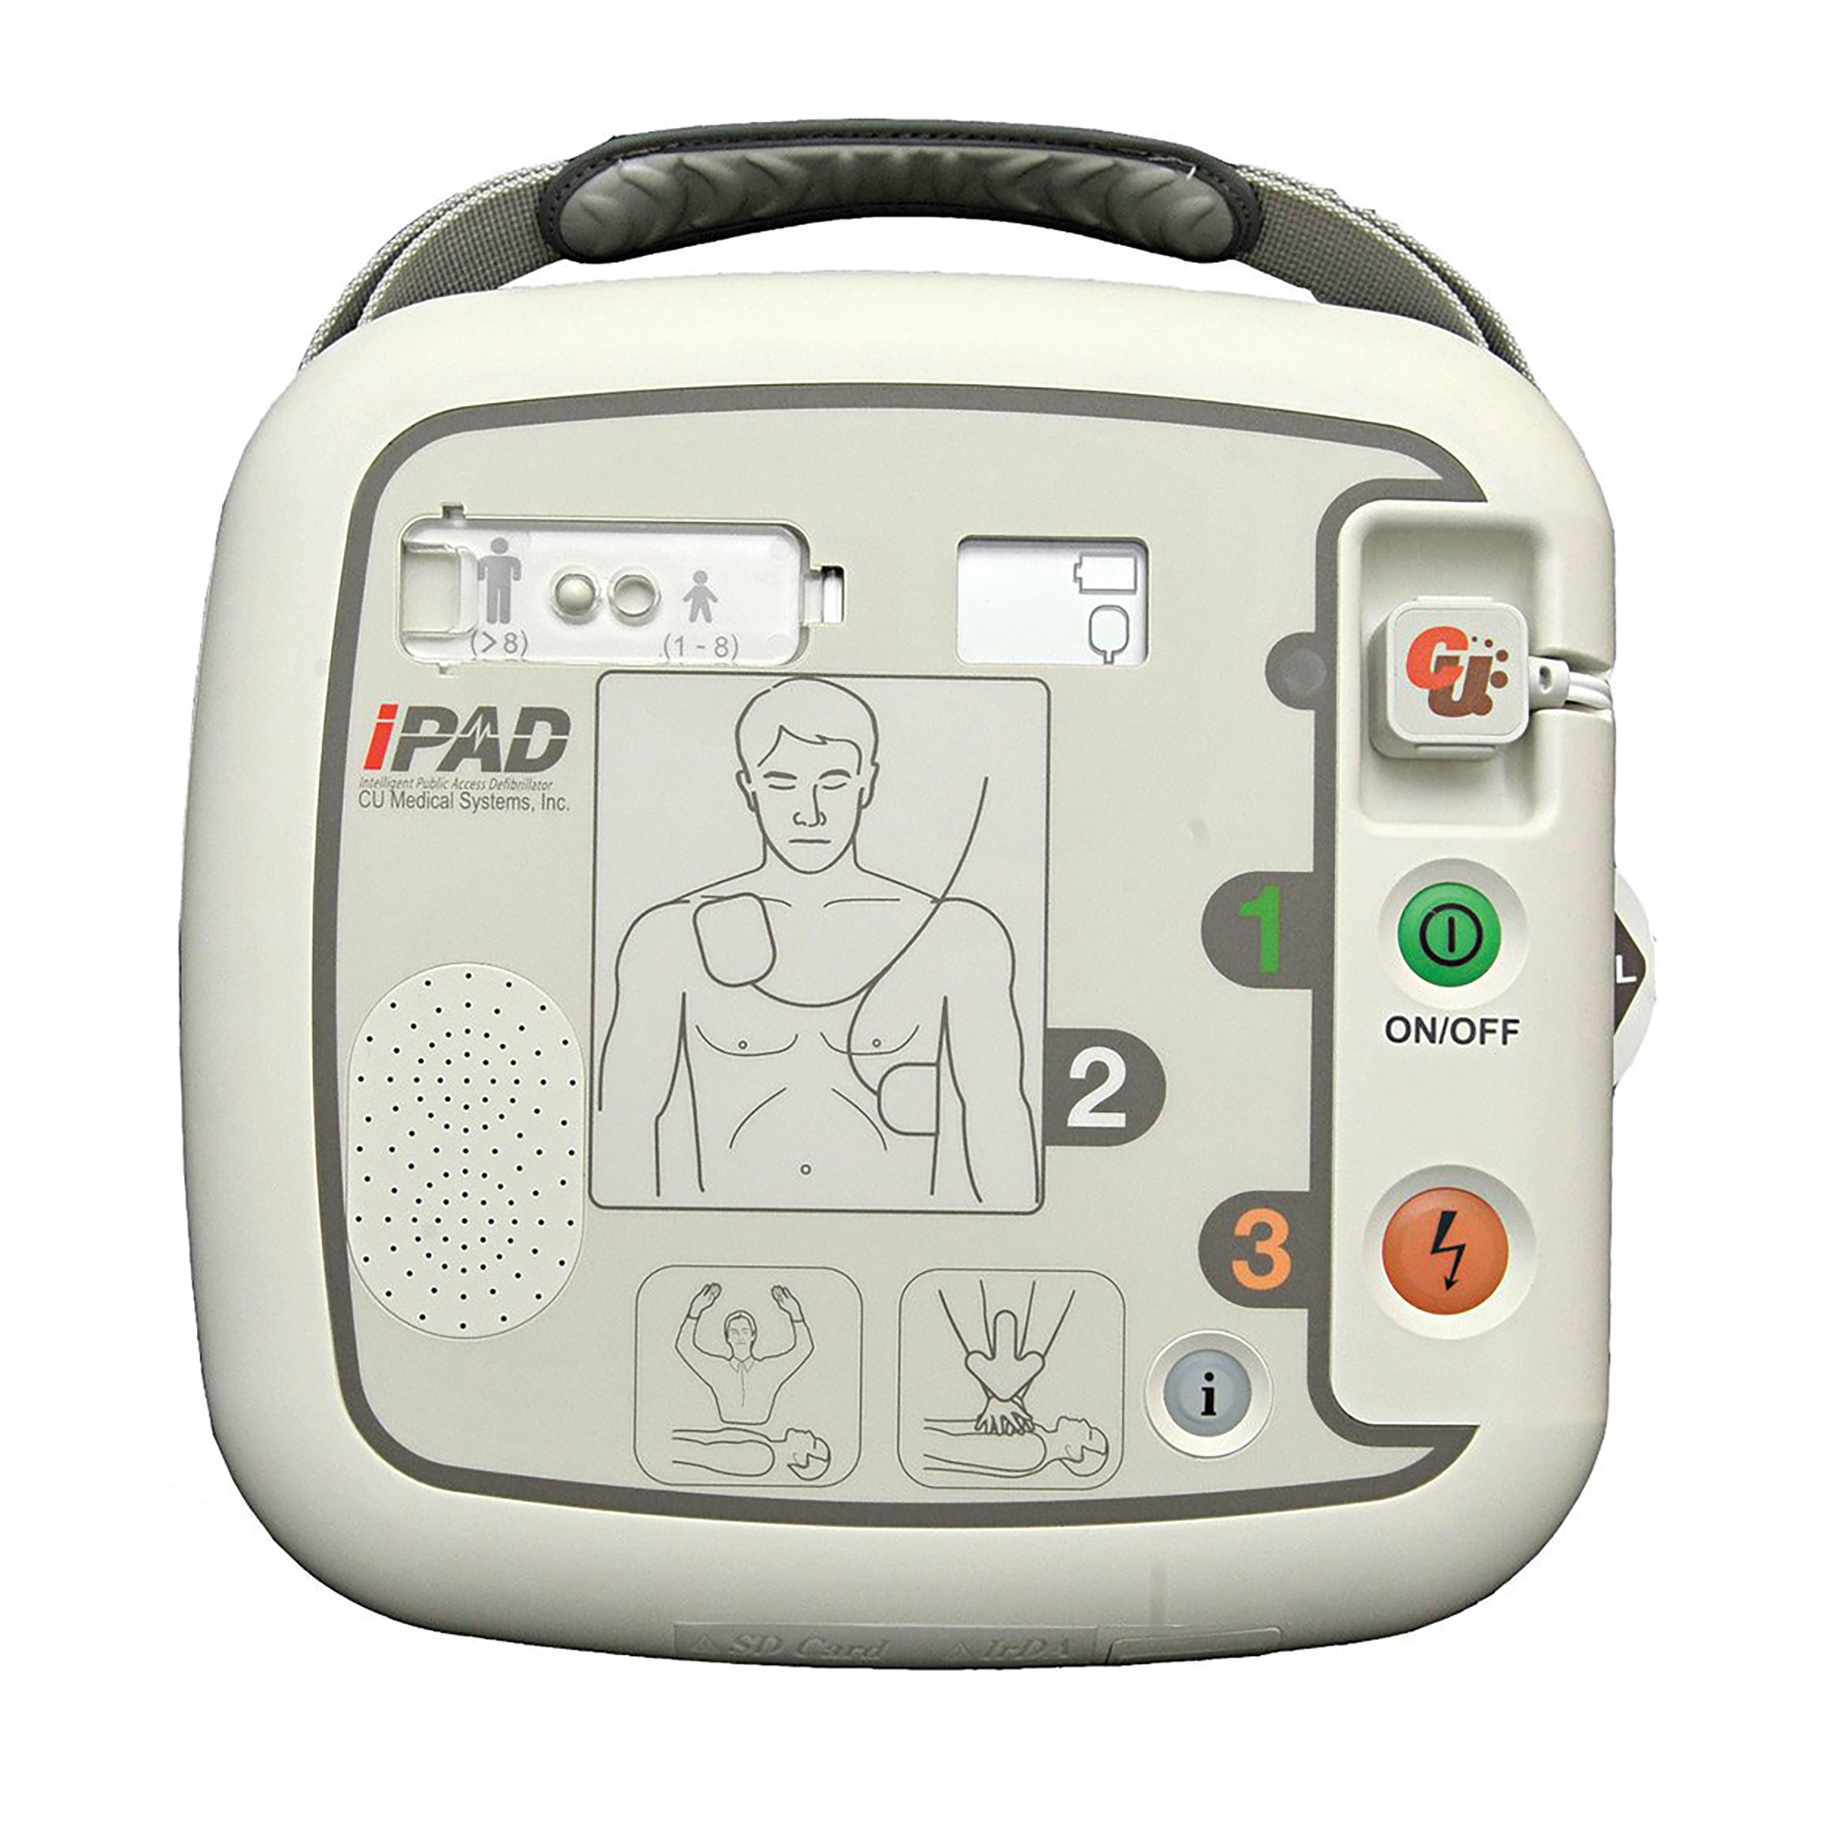 SP1 iPad Semi Auto Defibrillator